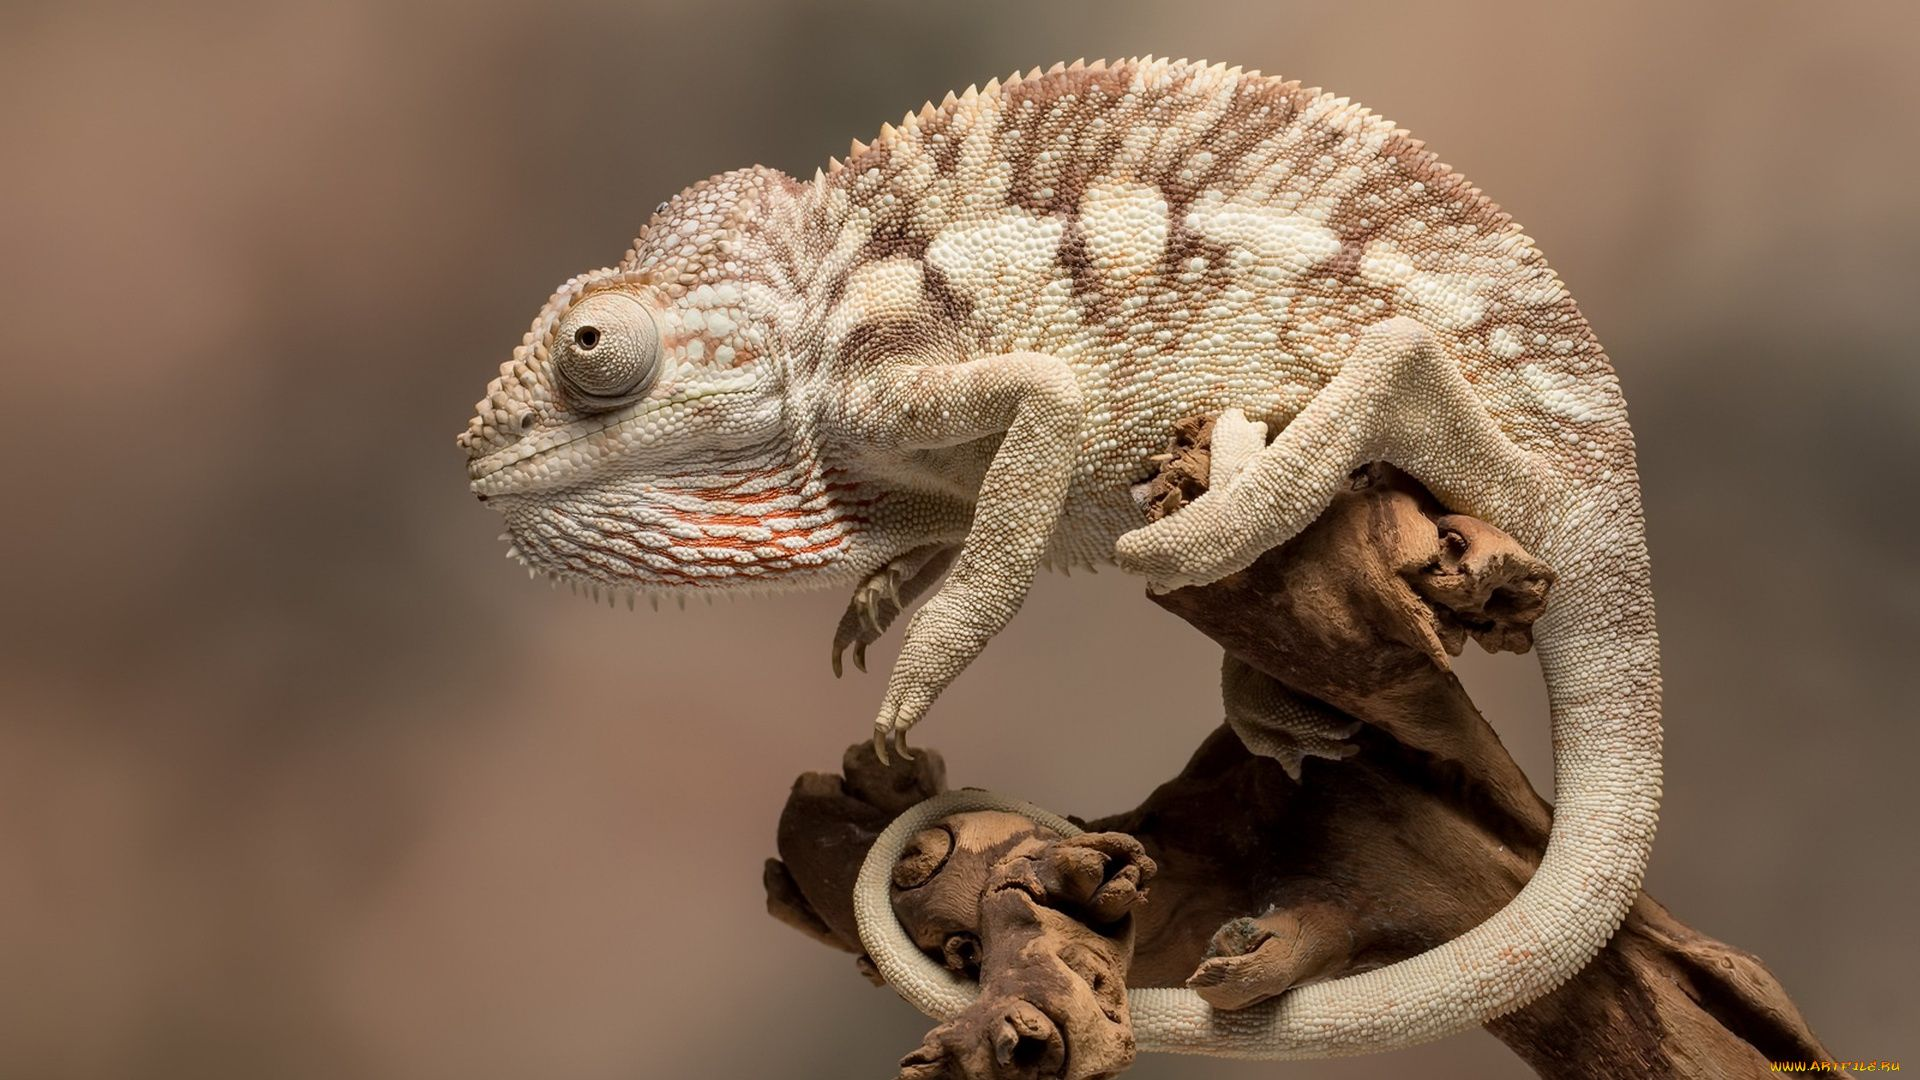 Chameleon Lizard Photo